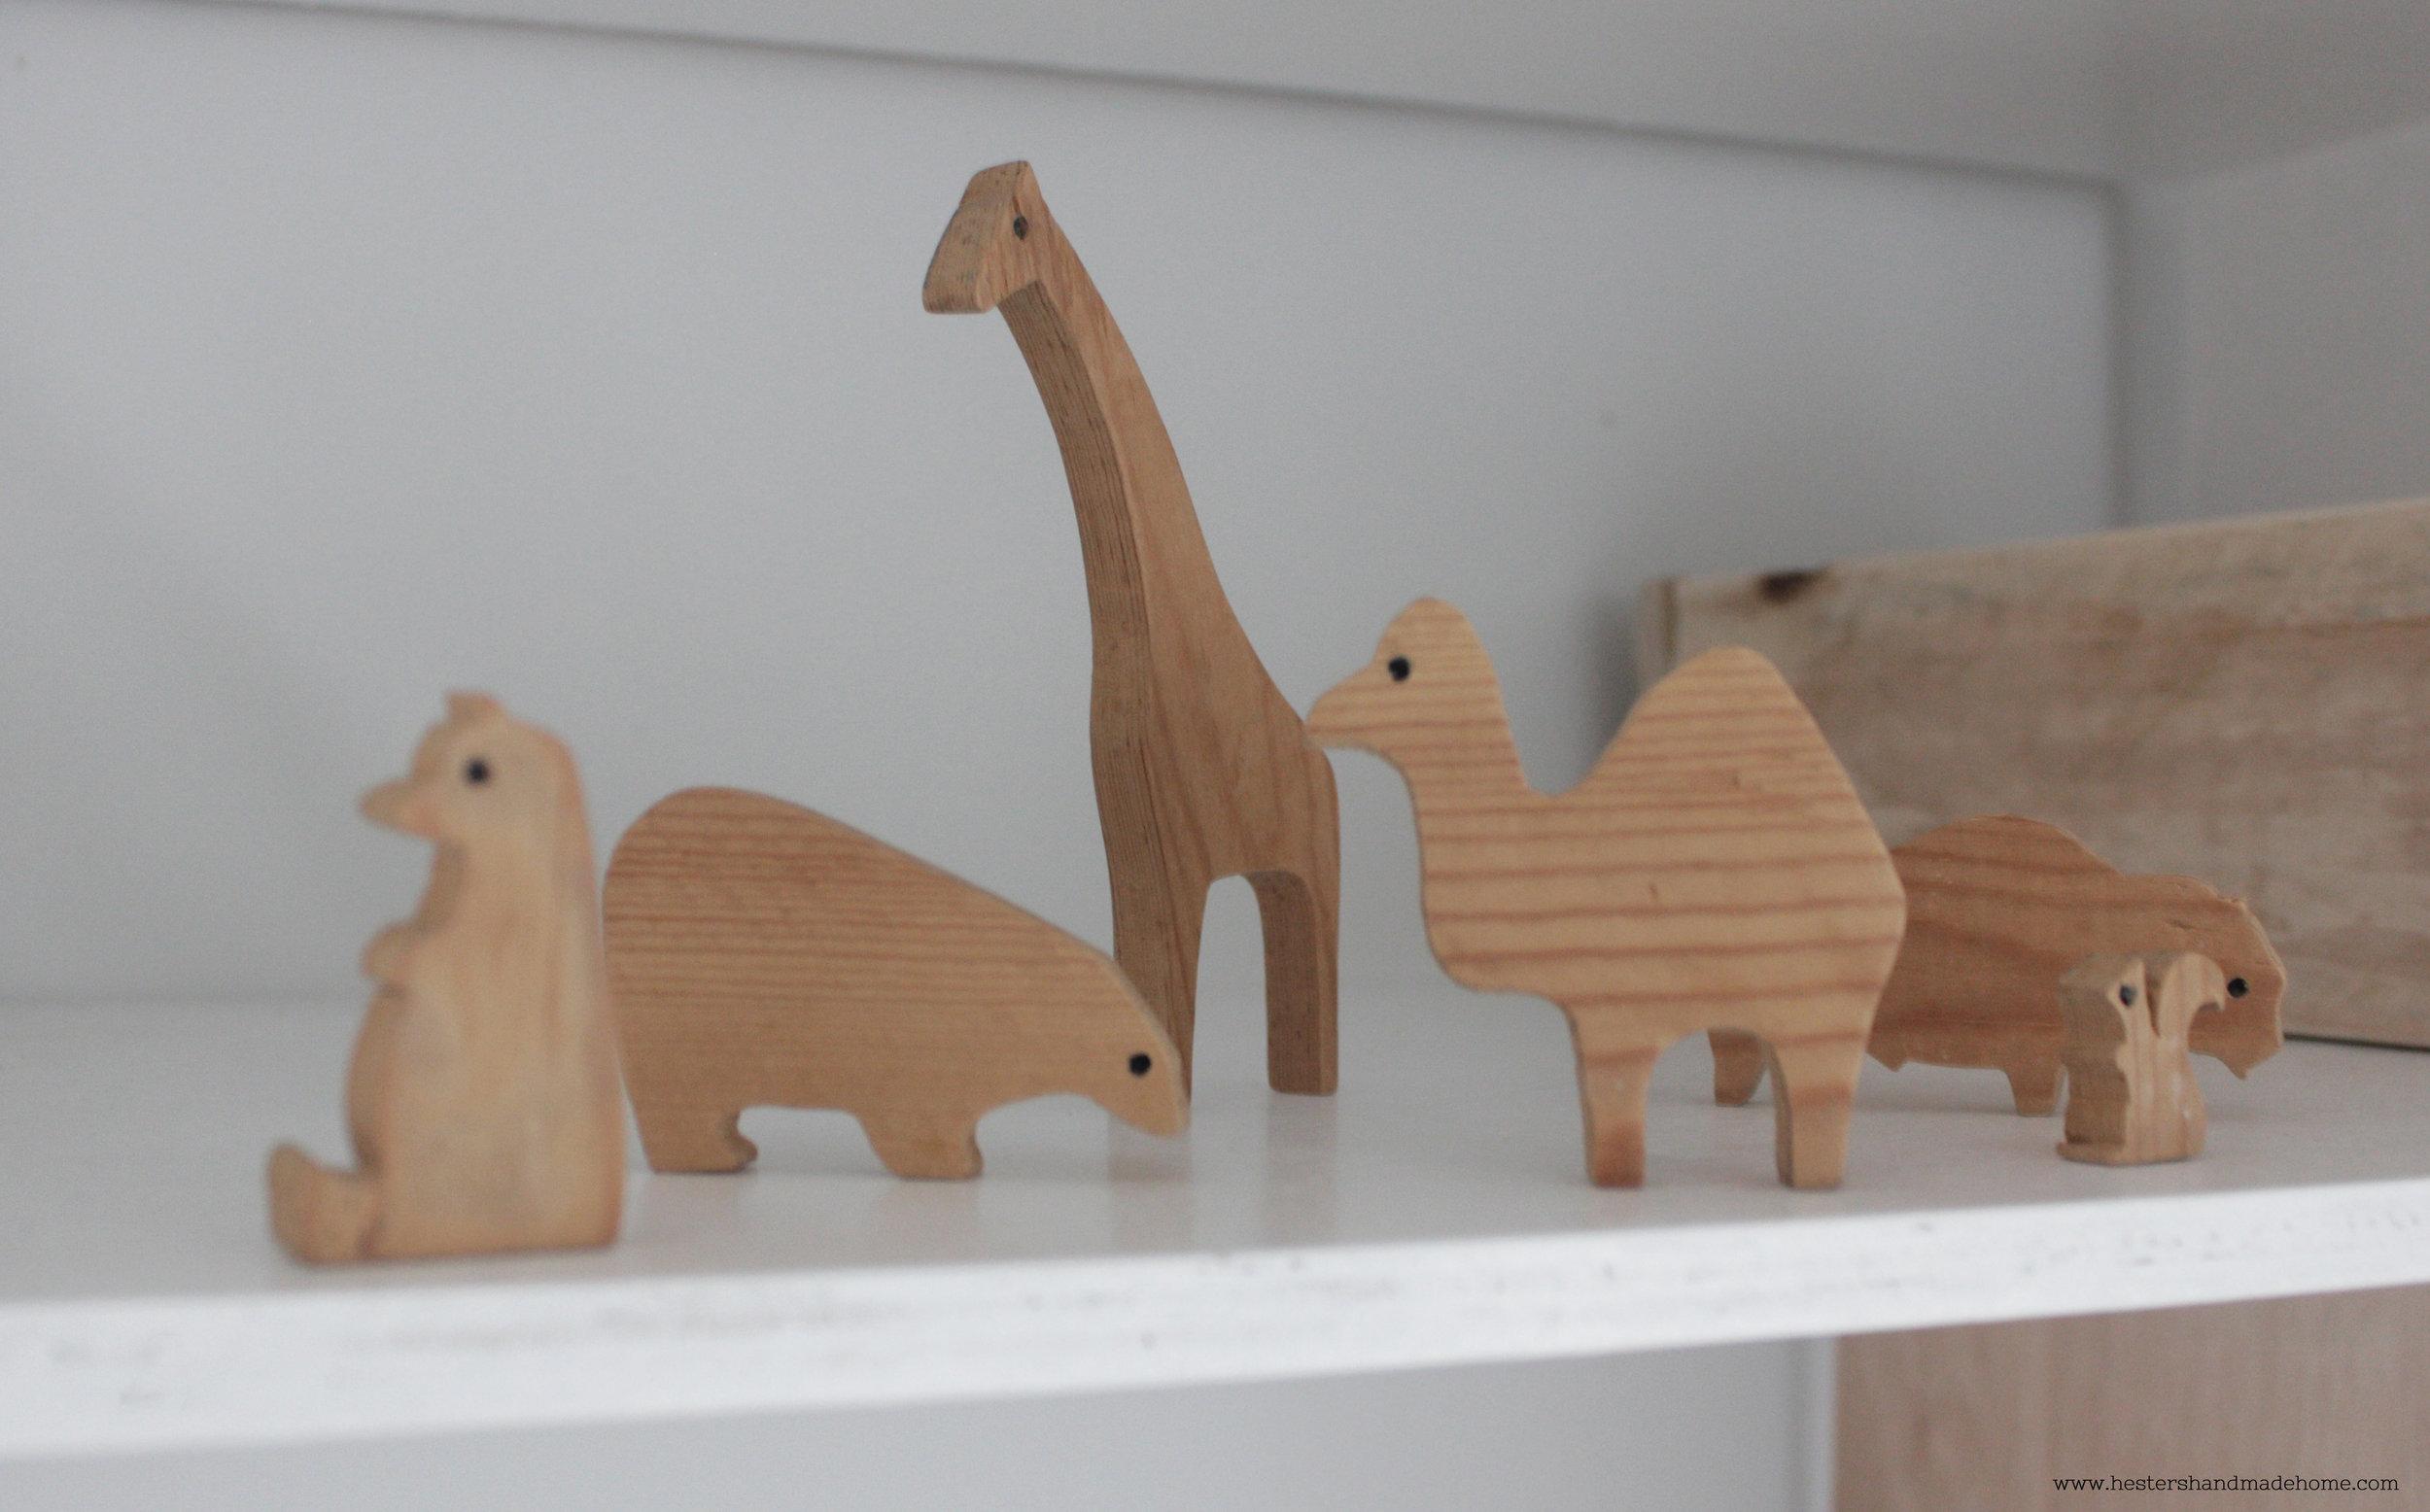 Wooden animal, nirsery decor tutorial by www.hestershandmadehome.com